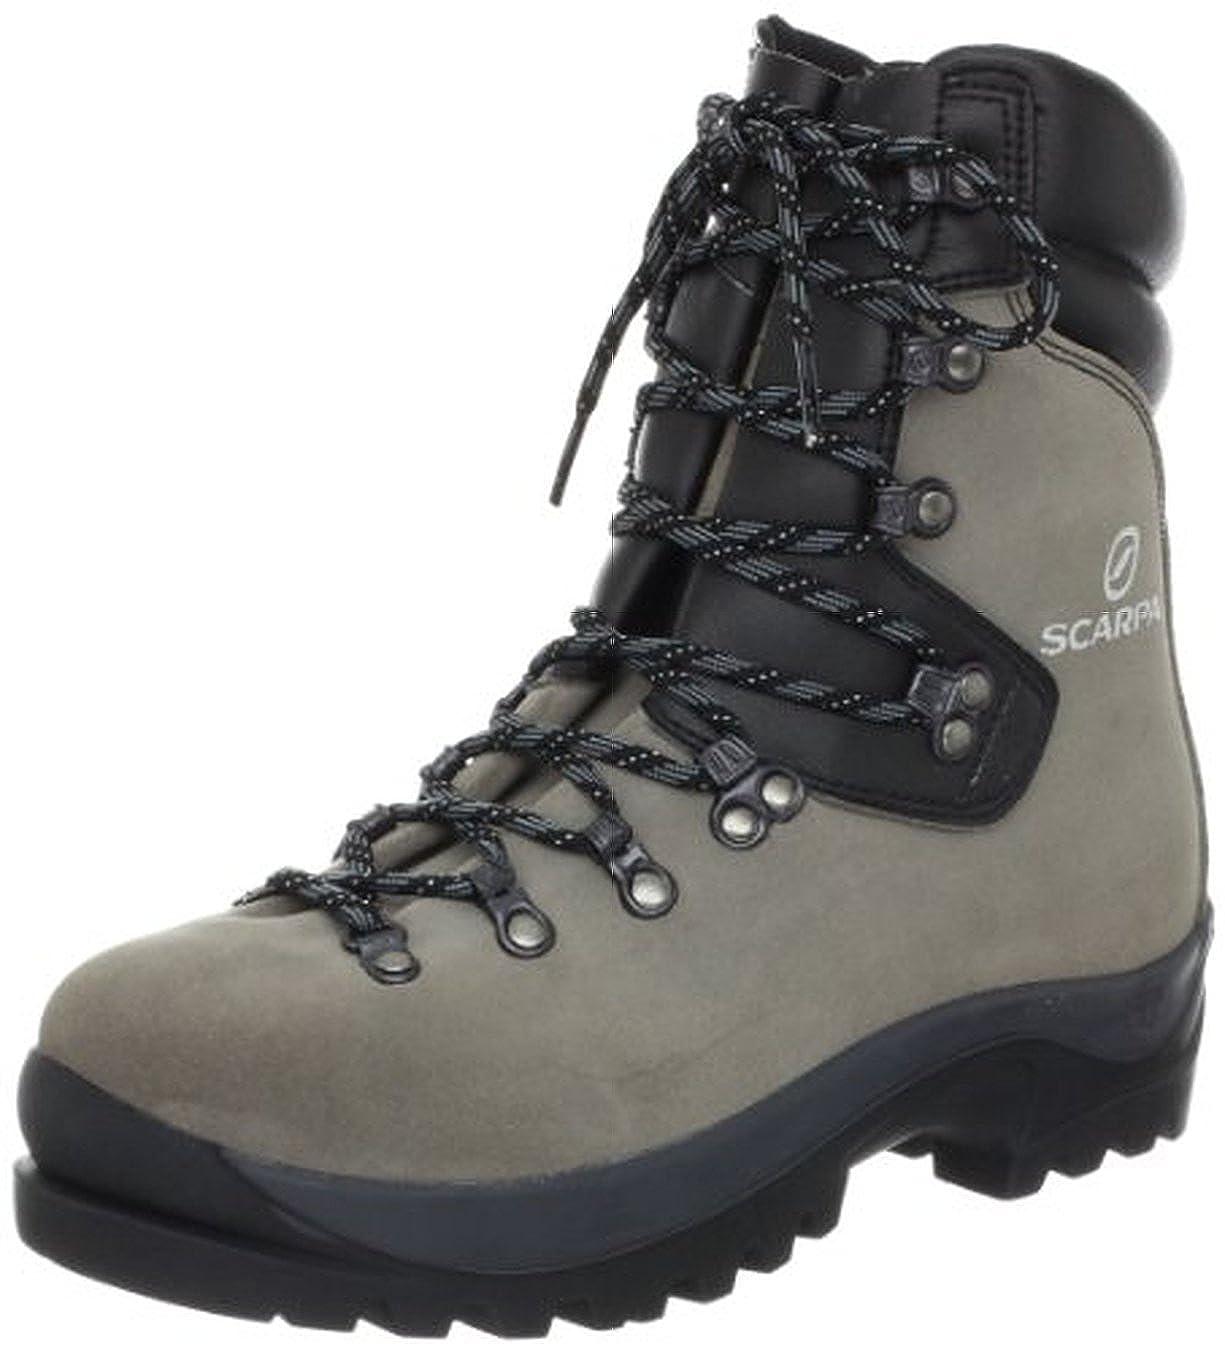 SCARPA Fuego Mountaineering Boots /& E-Tip Glove Bundle